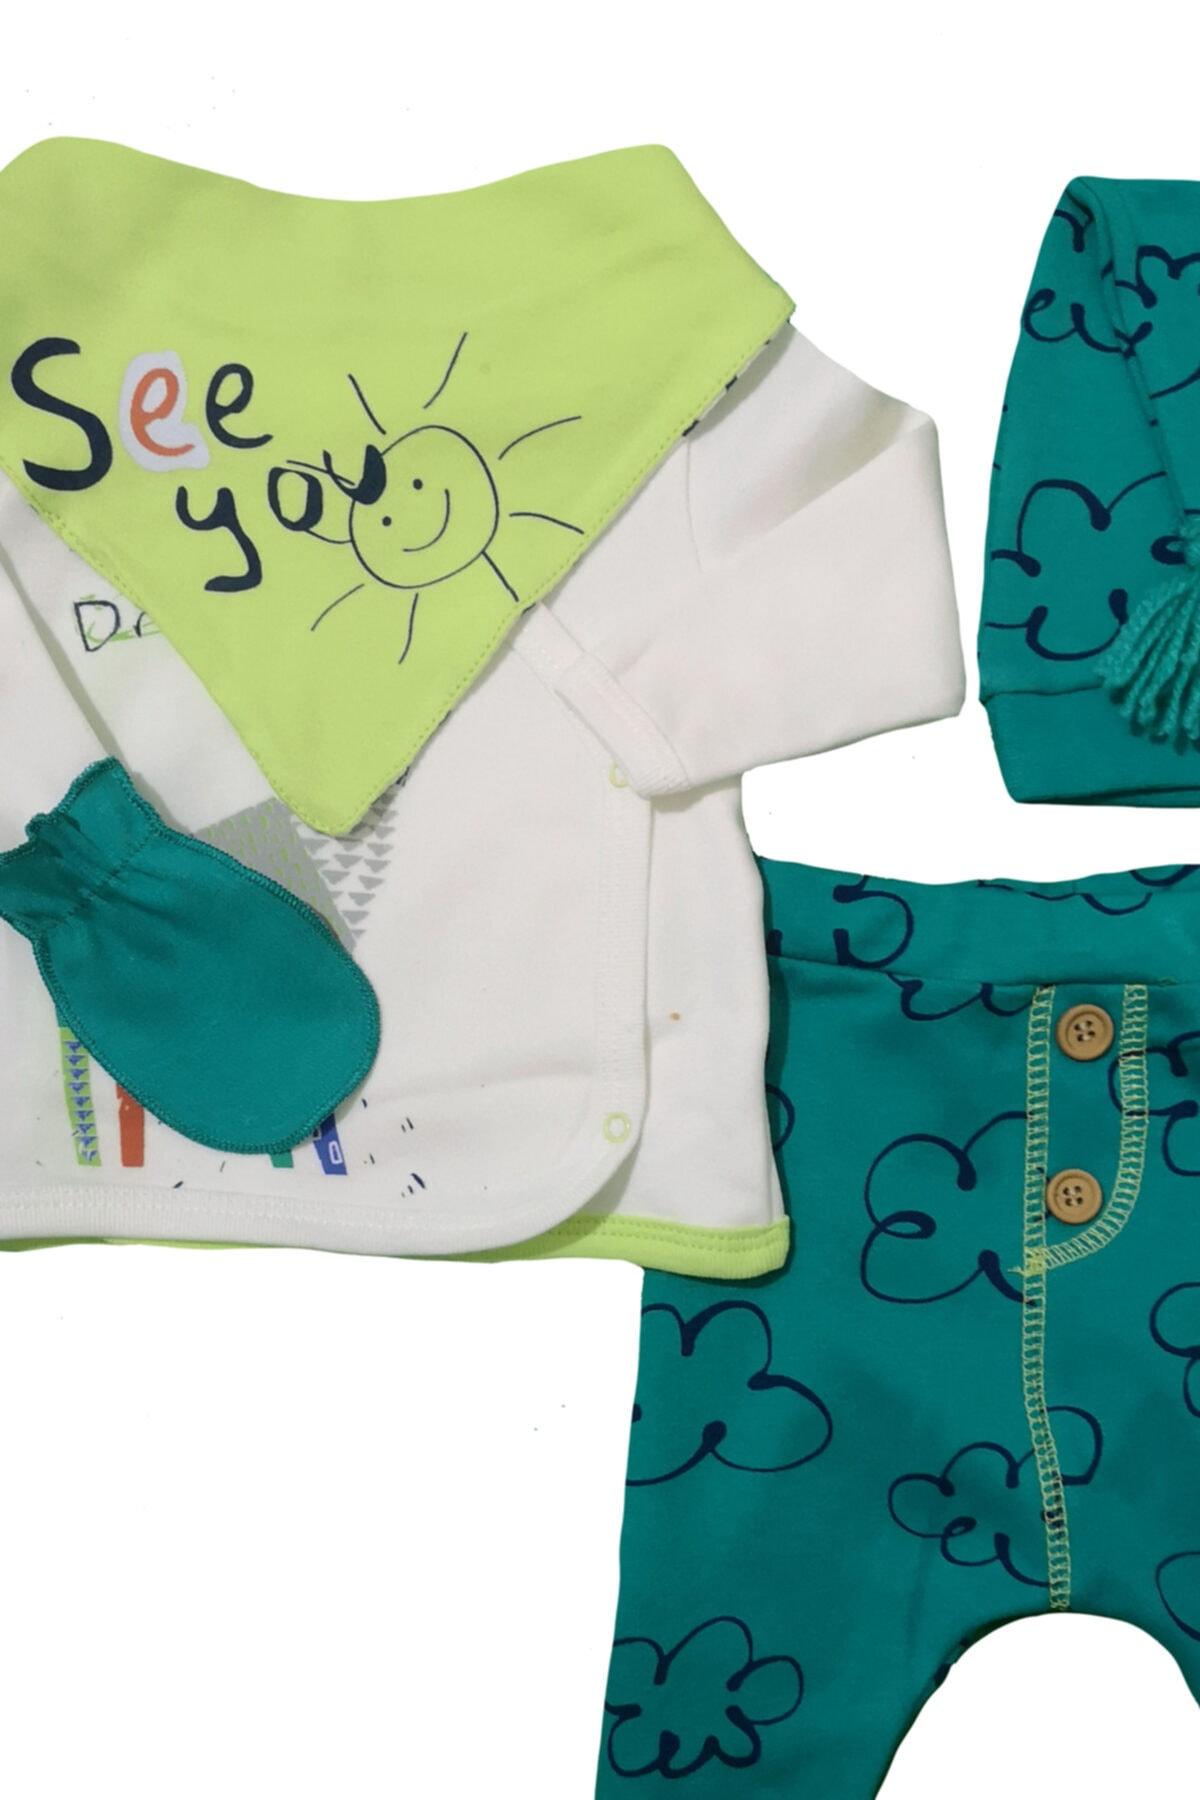 İmaj Erkek Bebek Yeşil See You Baskılı Hastane Çıkışı 5'li Set 2